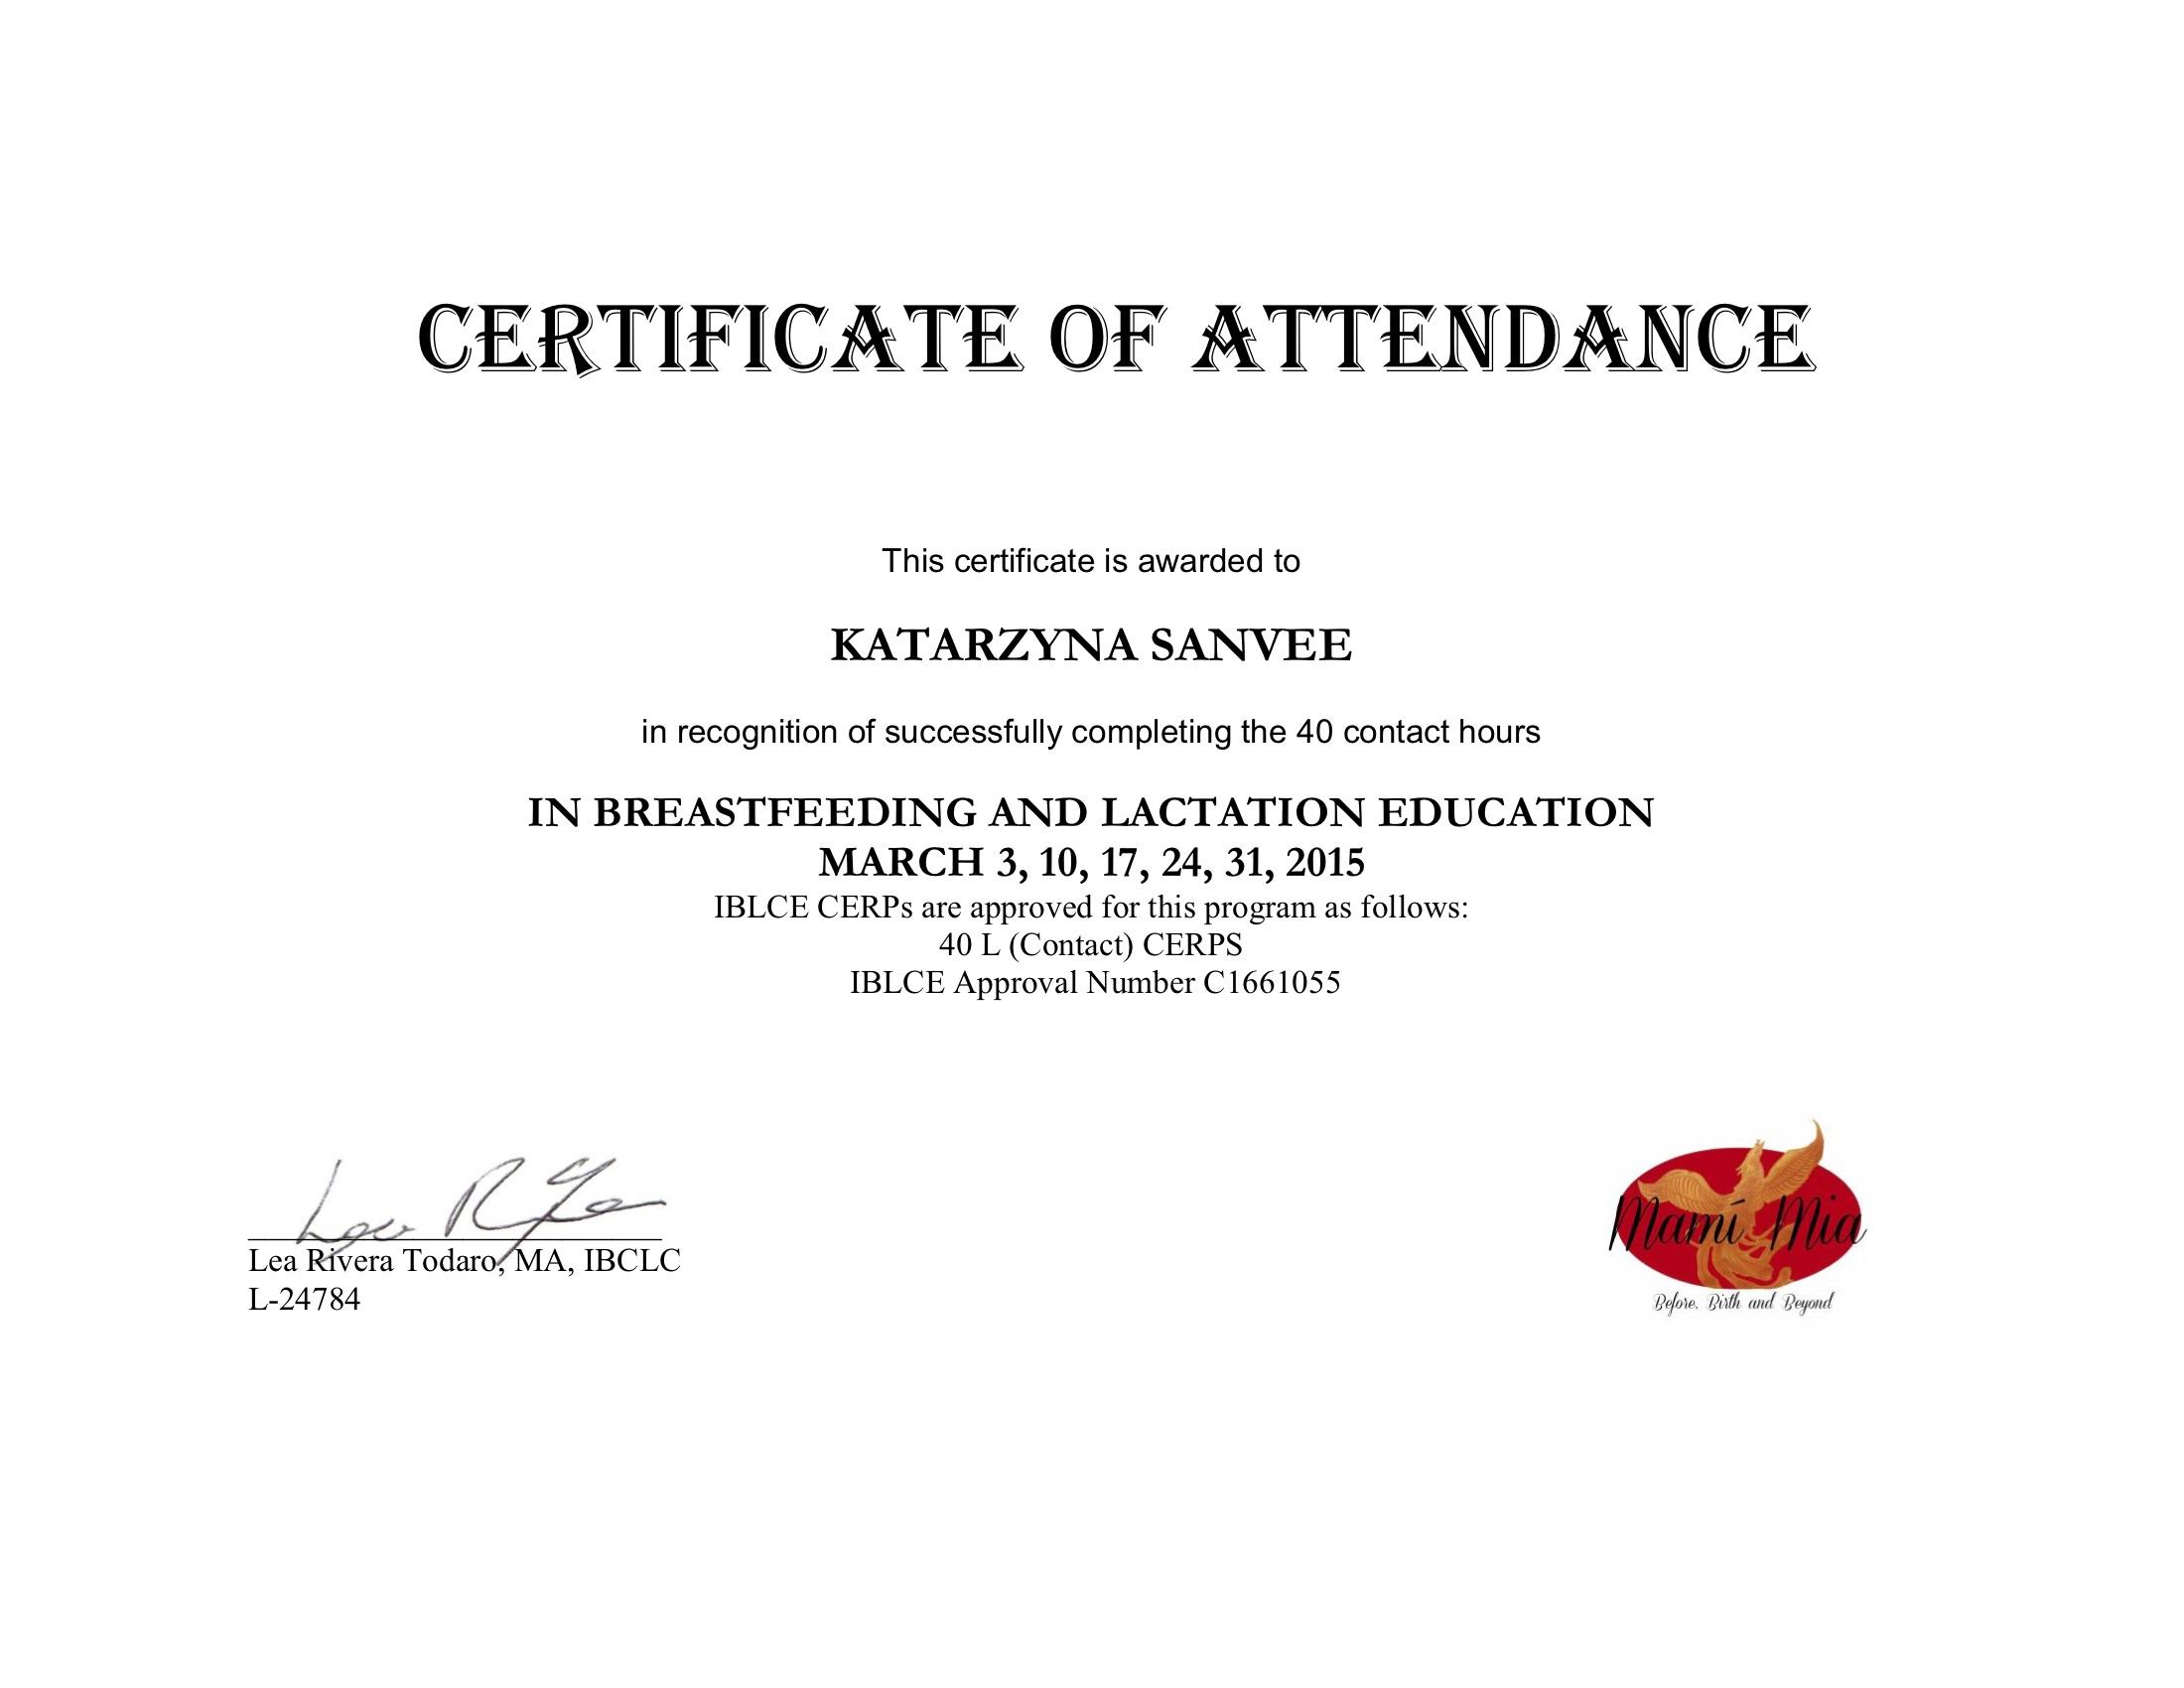 CBC_BreastfeedingCounselor_Sanvee Attendance 2015.jpg